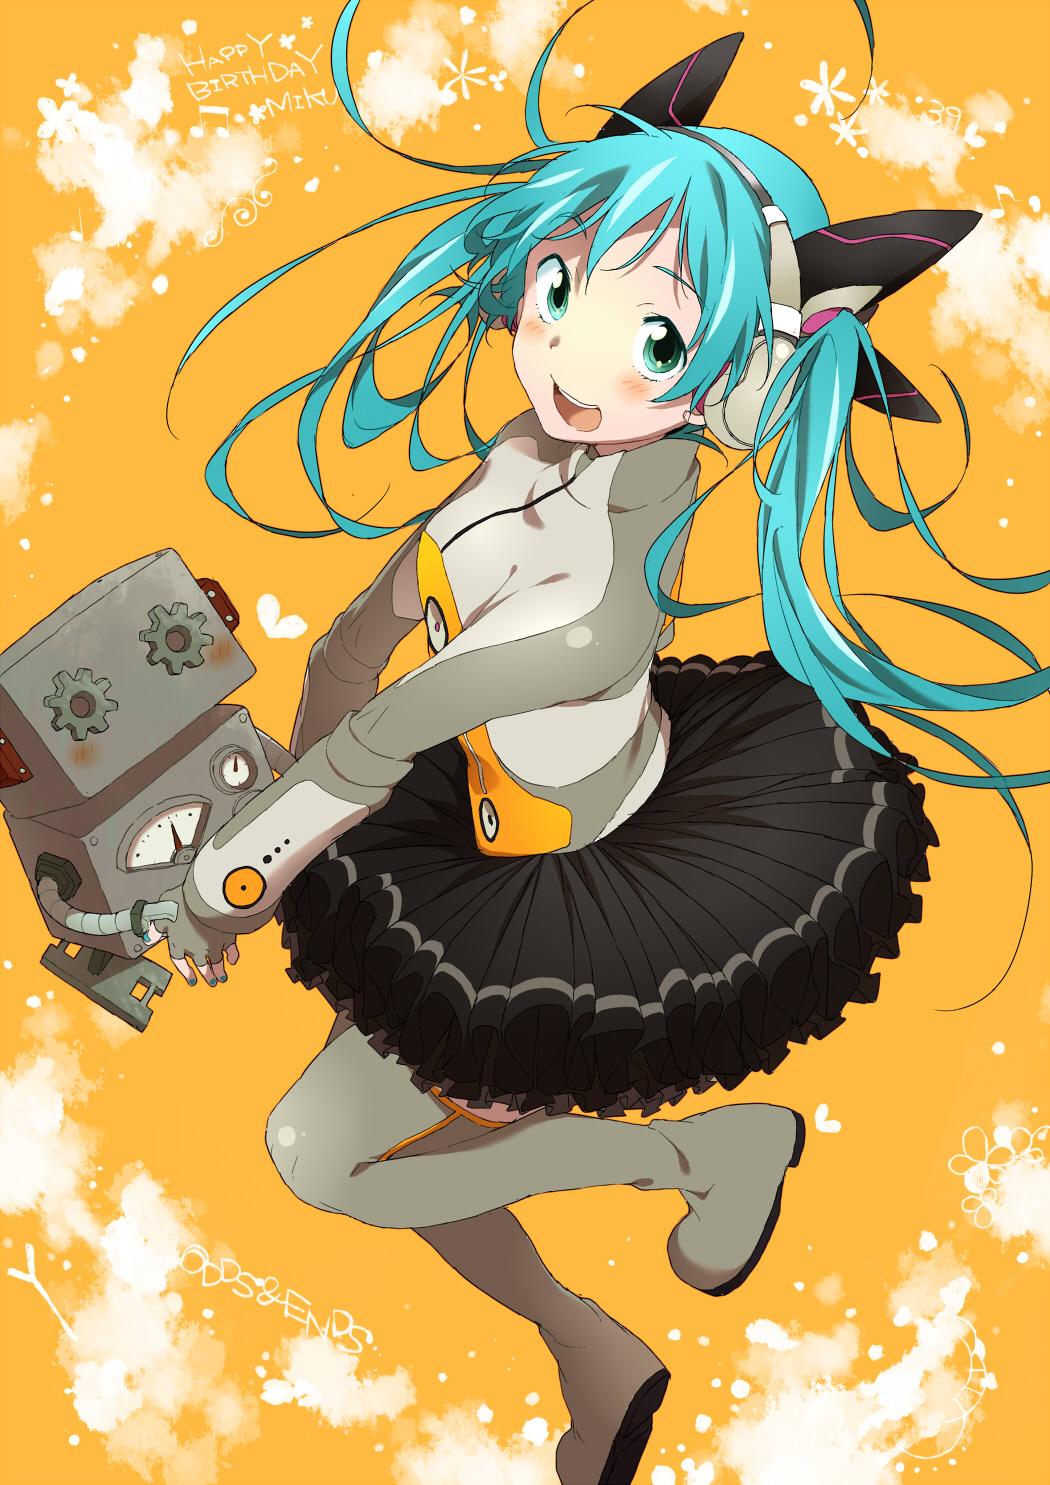 Hatsune miku 1251820 zerochan - Cyber diva vocaloid ...